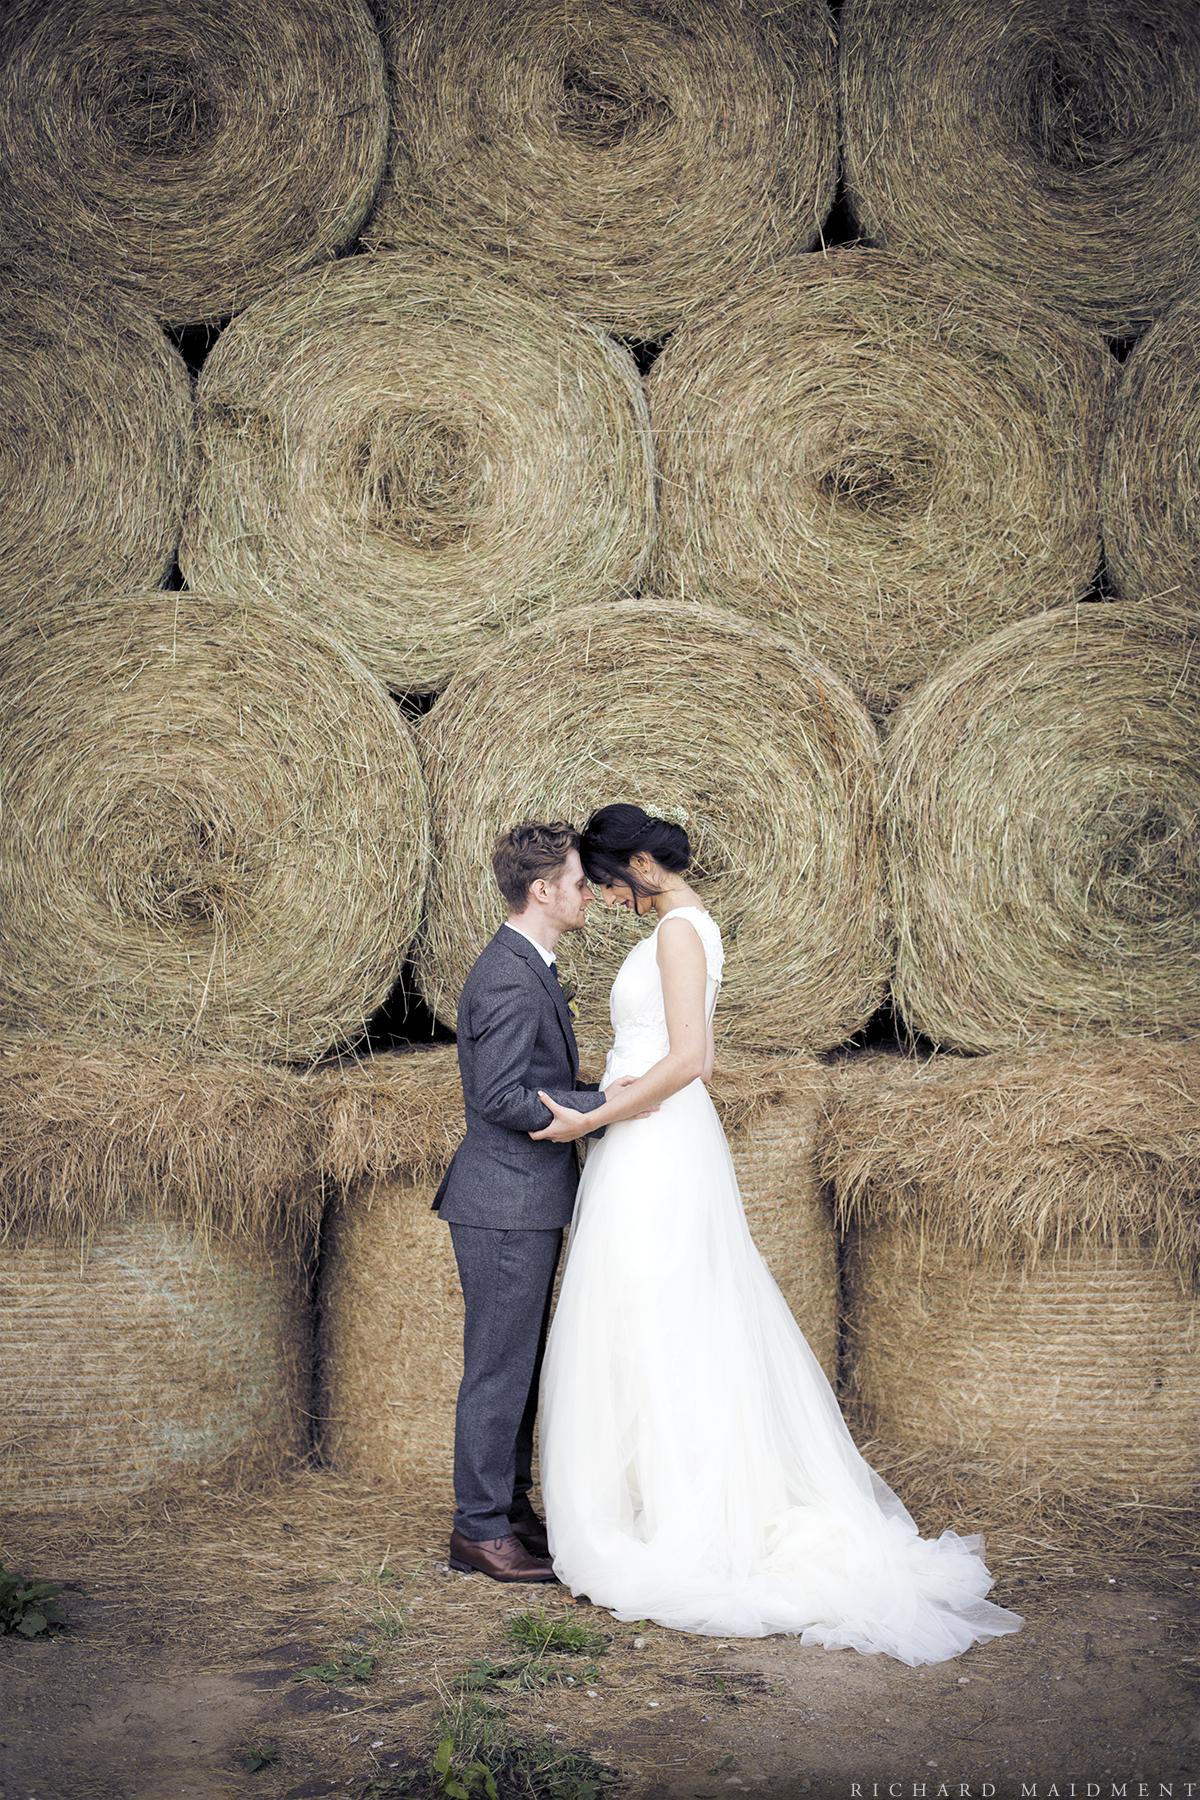 Richard Maidment - Wedding Photography (7).jpg